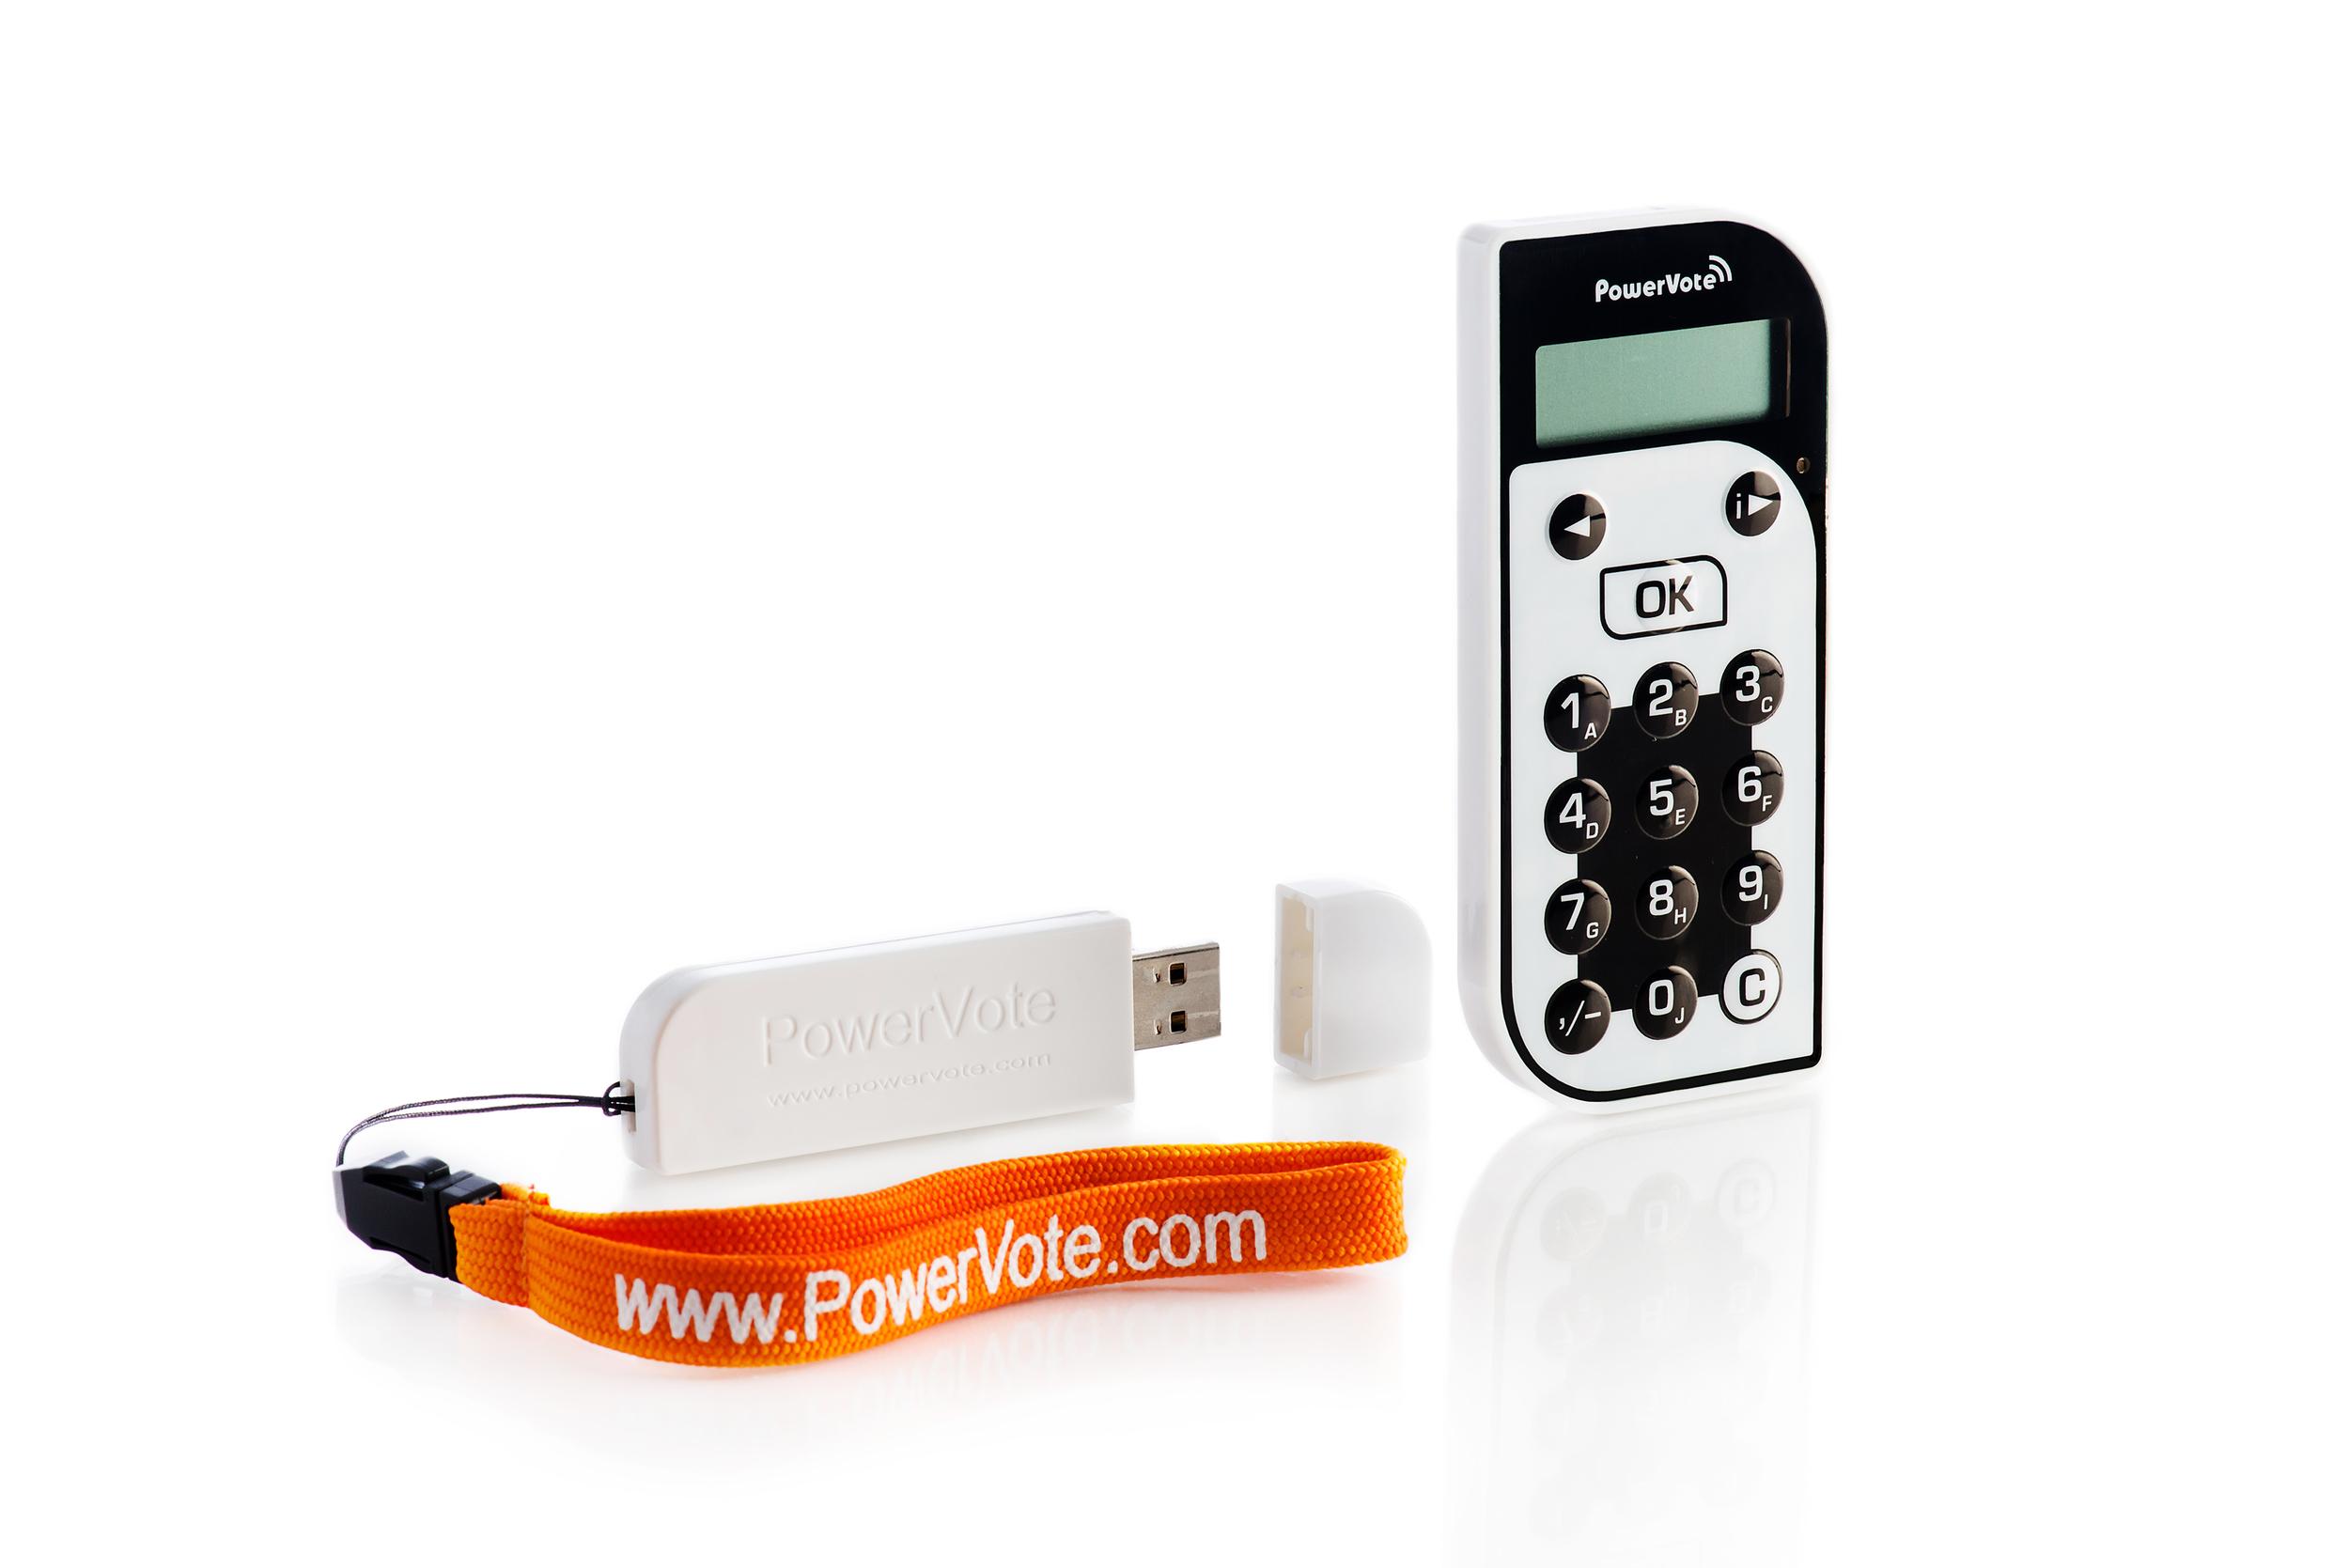 Powervote Product_MJP-7.jpg